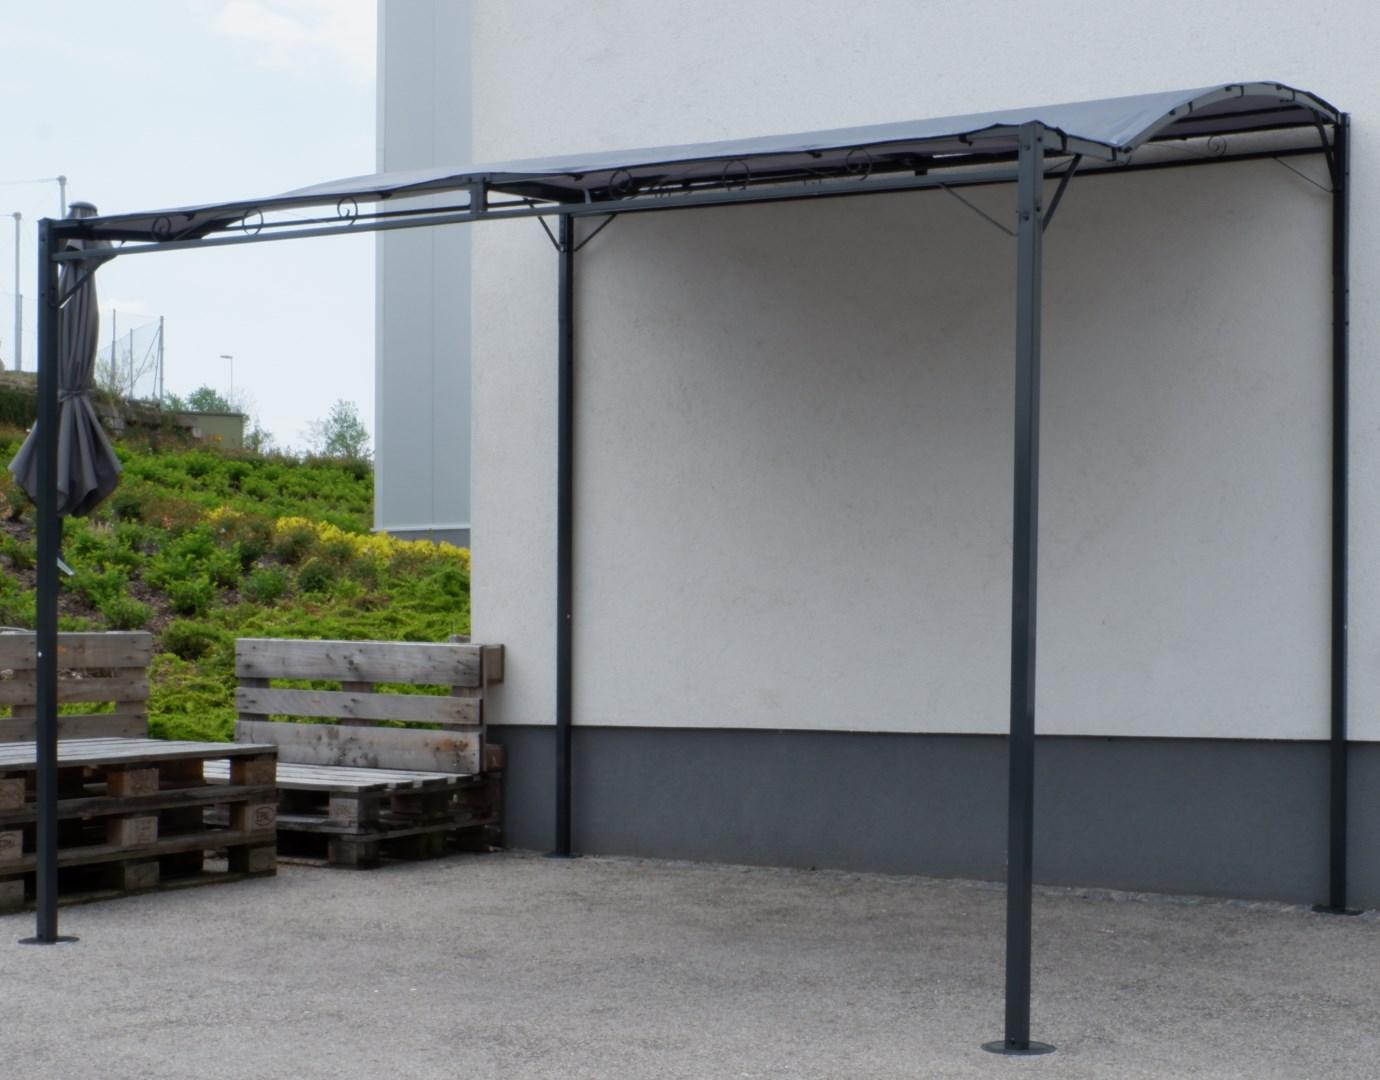 wand anbau pavillon 3 x 2 5 meter mit dach 100 wasserdicht uv30 model topea anthrazit alles